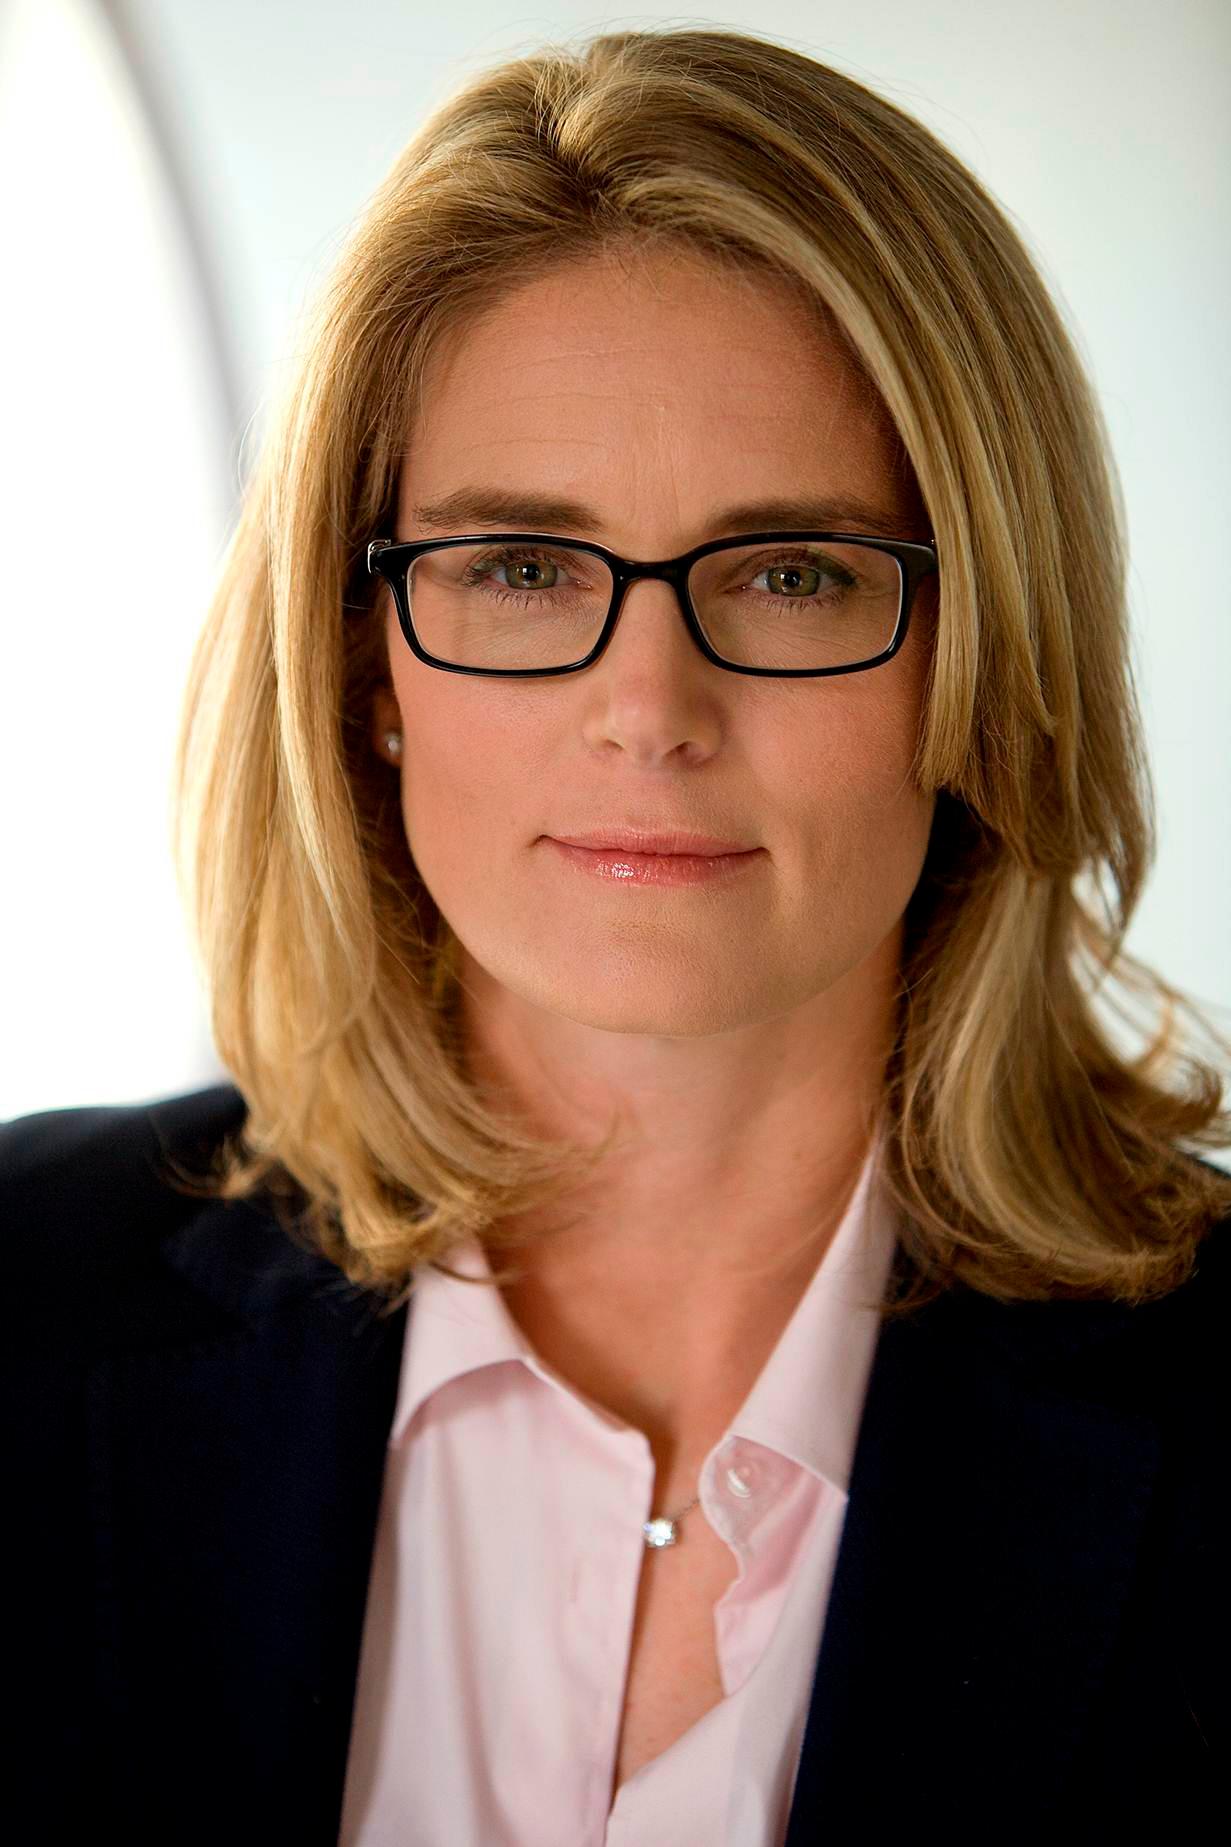 Emma Watts, Vice Chairman of Twentieth Century Fox Film (TCFF) and President of Production for Twentieth Century Fox (TCF)(Photo: Business Wire)